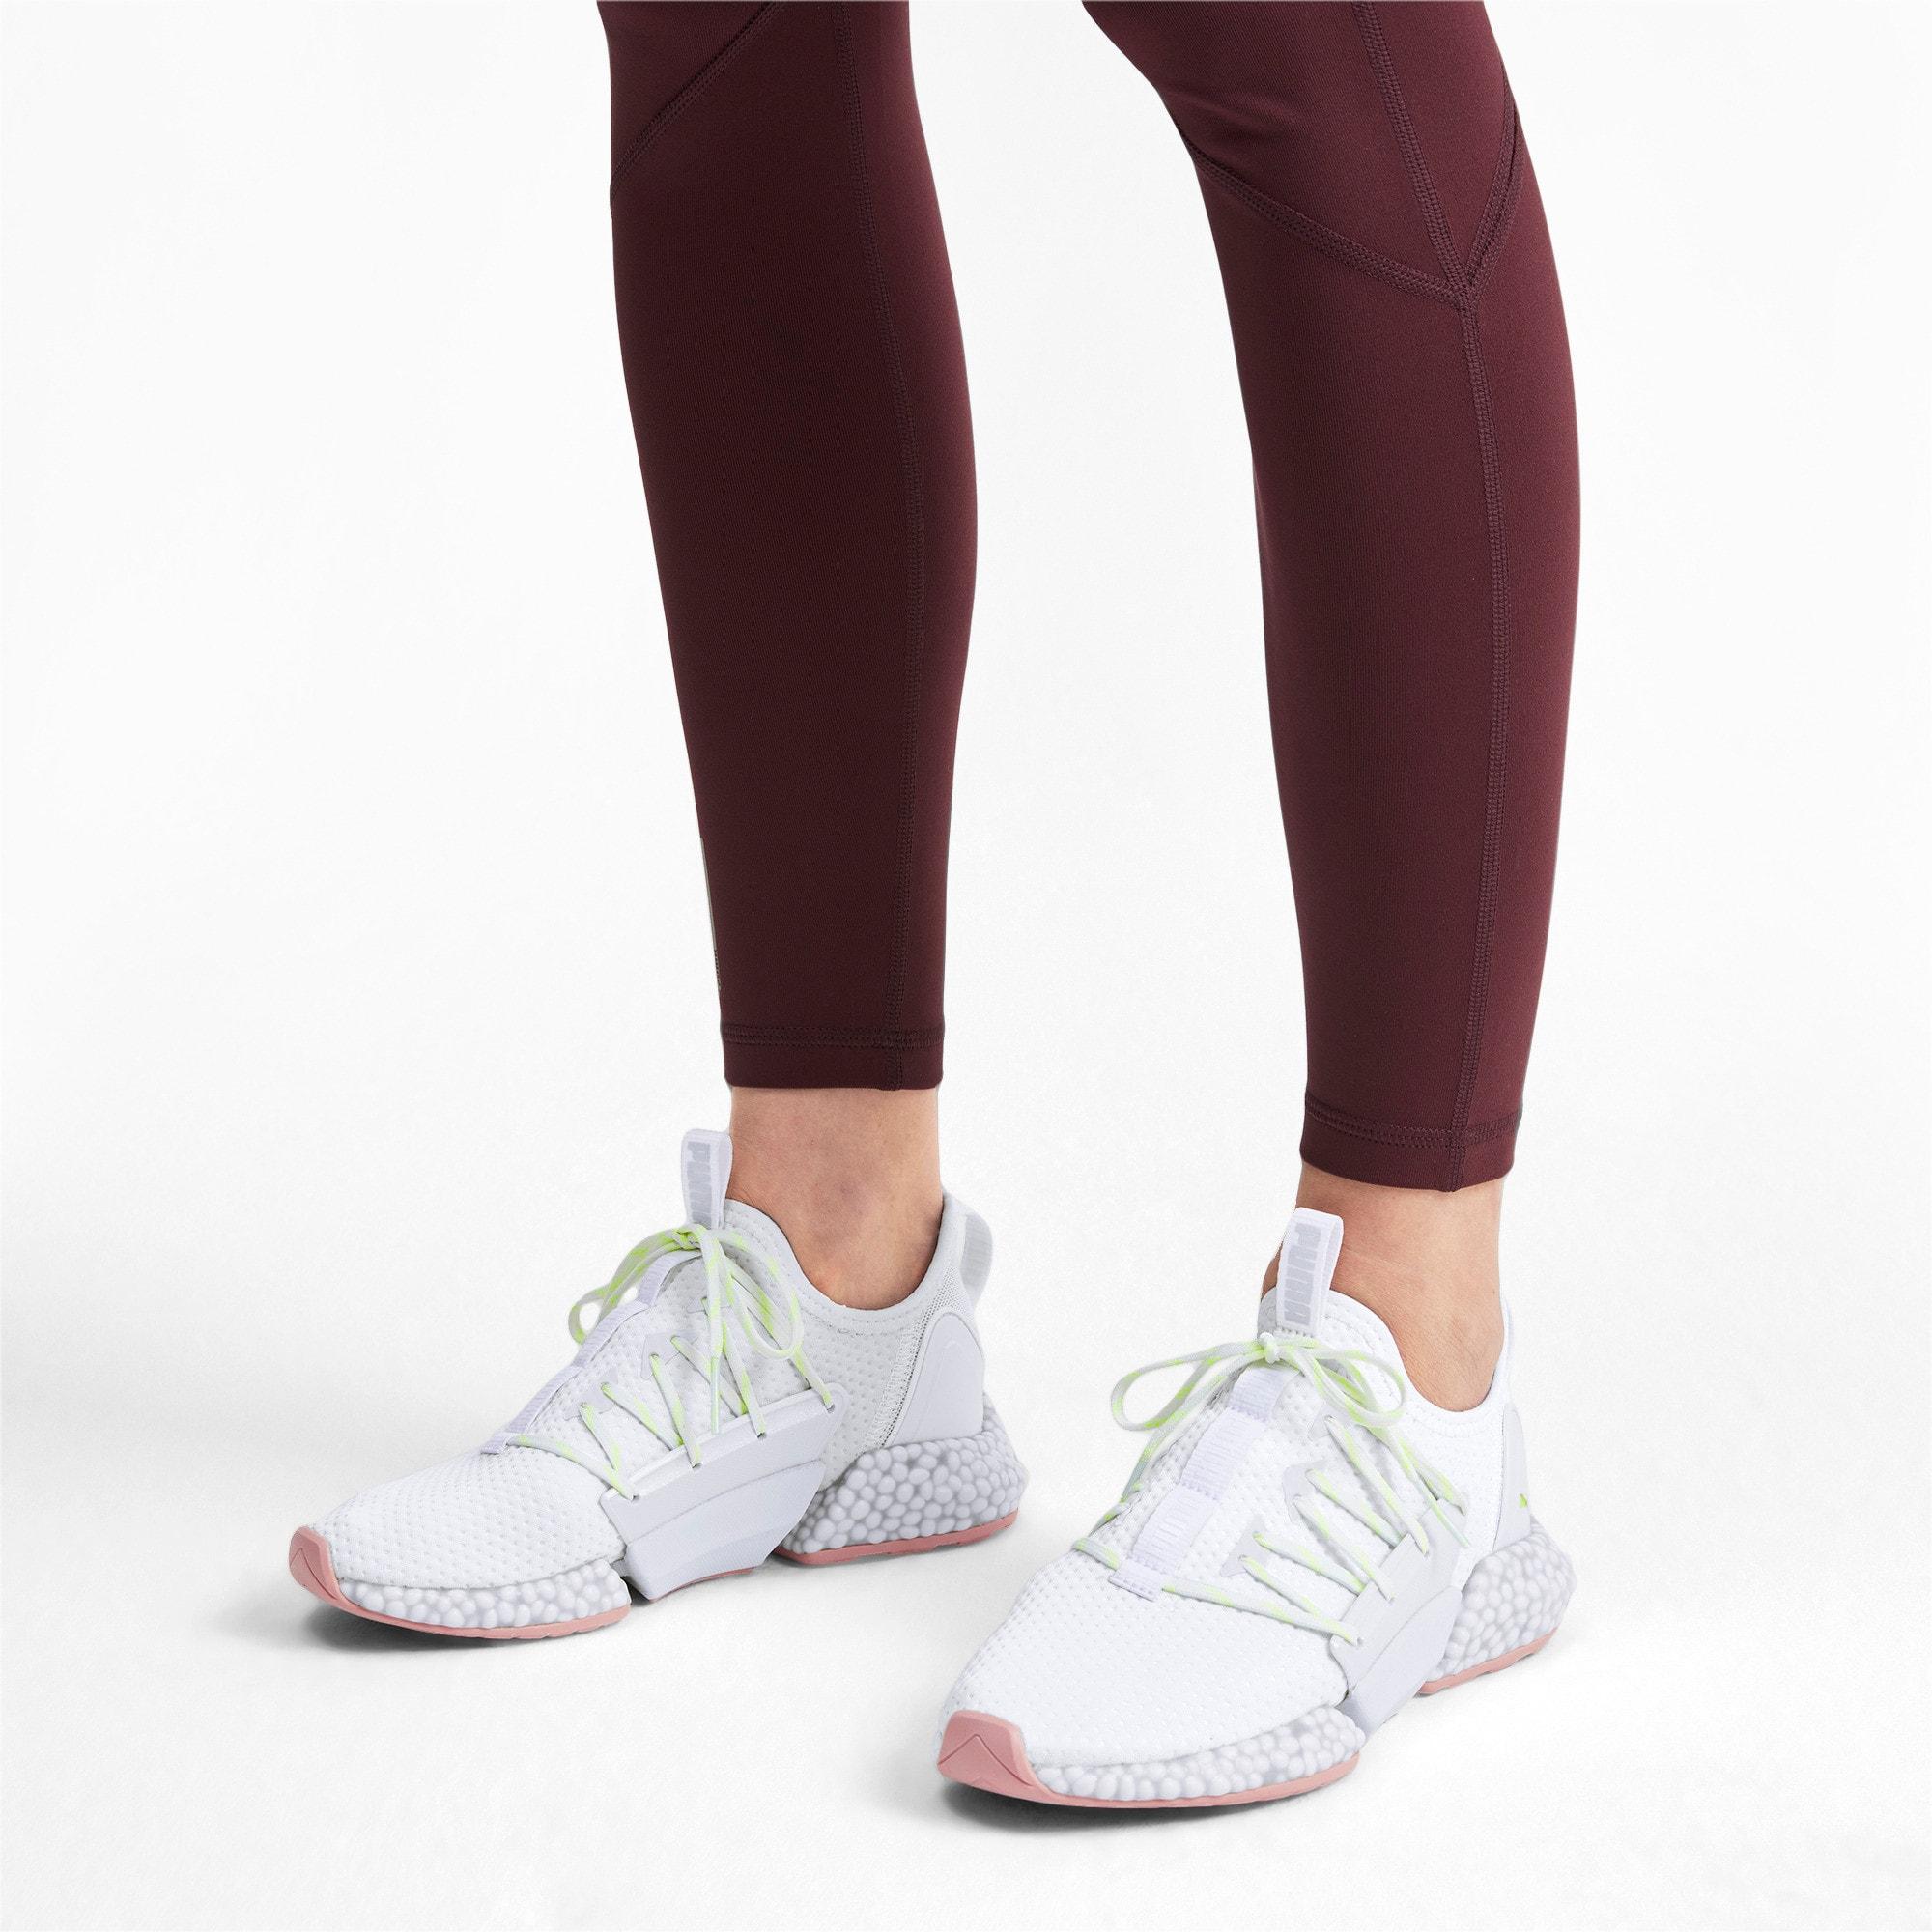 Thumbnail 3 of HYBRID Rocket Aero Women's Running Shoes, Puma White-Bridal Rose, medium